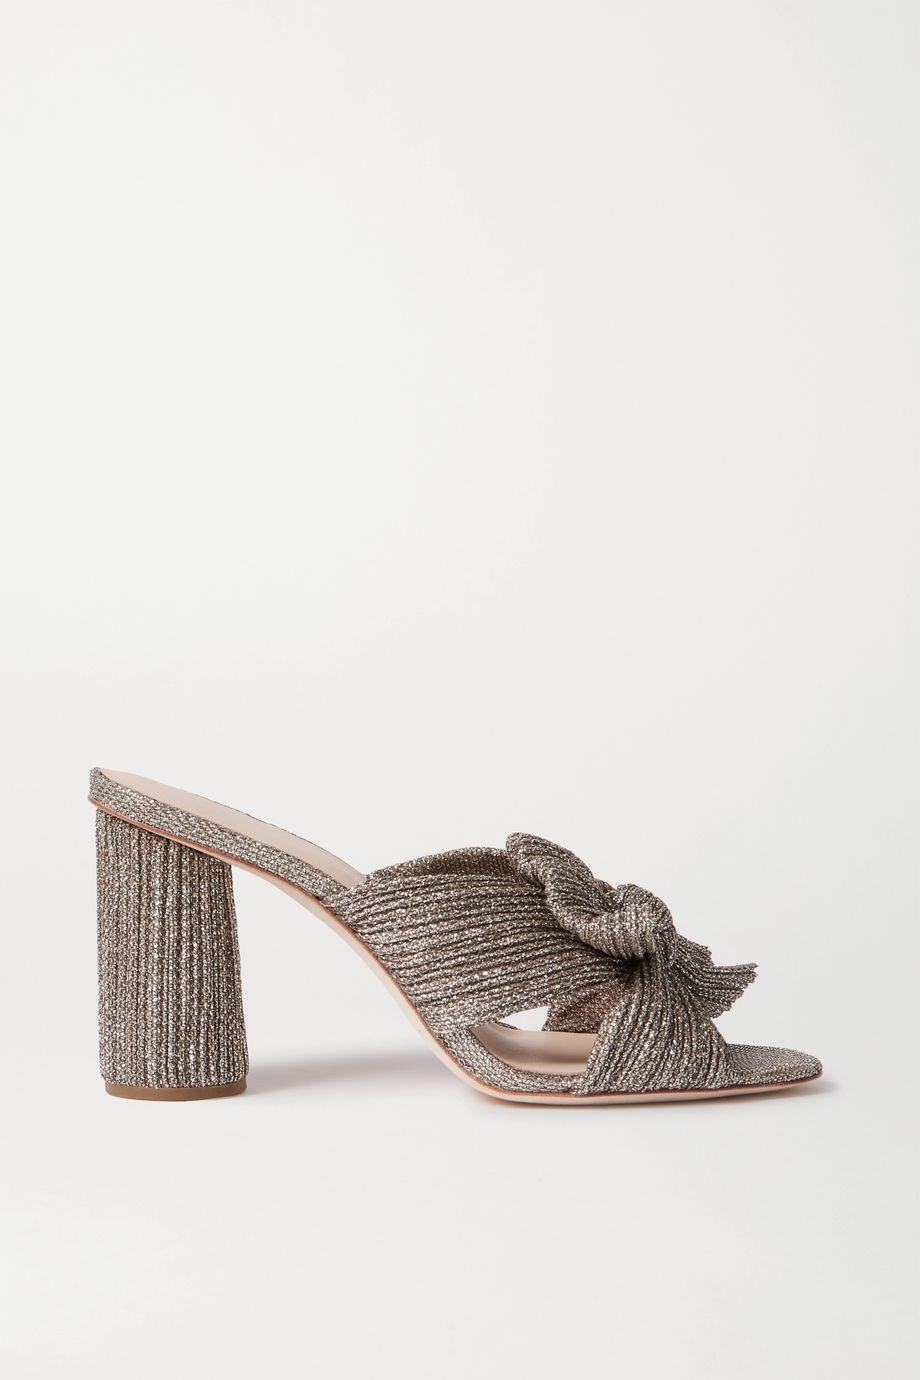 Loeffler Randall Penny bow-embellished plissé-lamé mules